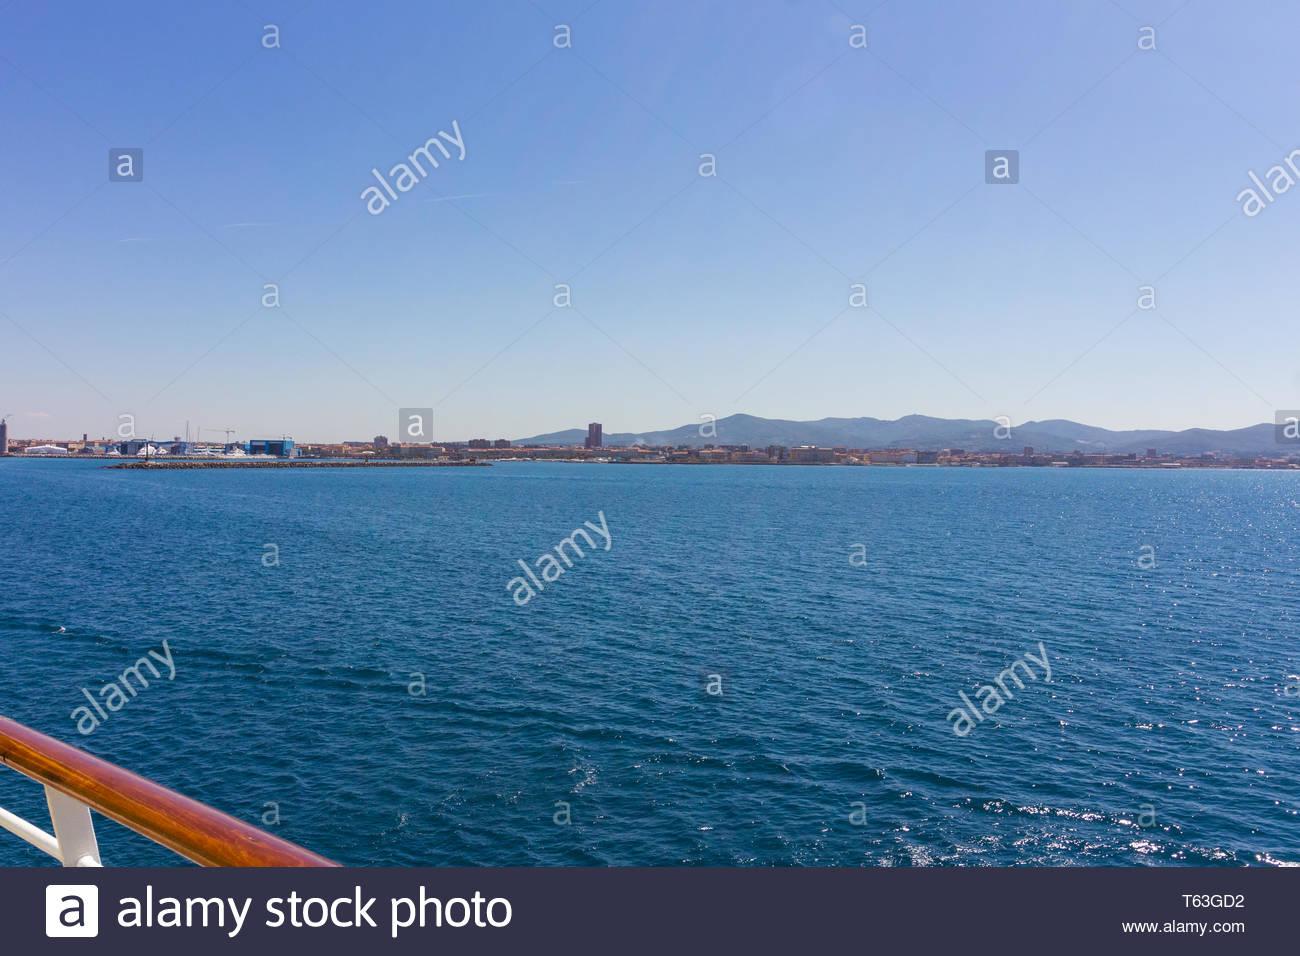 Pisa, Italy - May, 17, 2017: Looking out to seas as a royal caribbean ship pulls into Marina di Pisa. - Stock Image